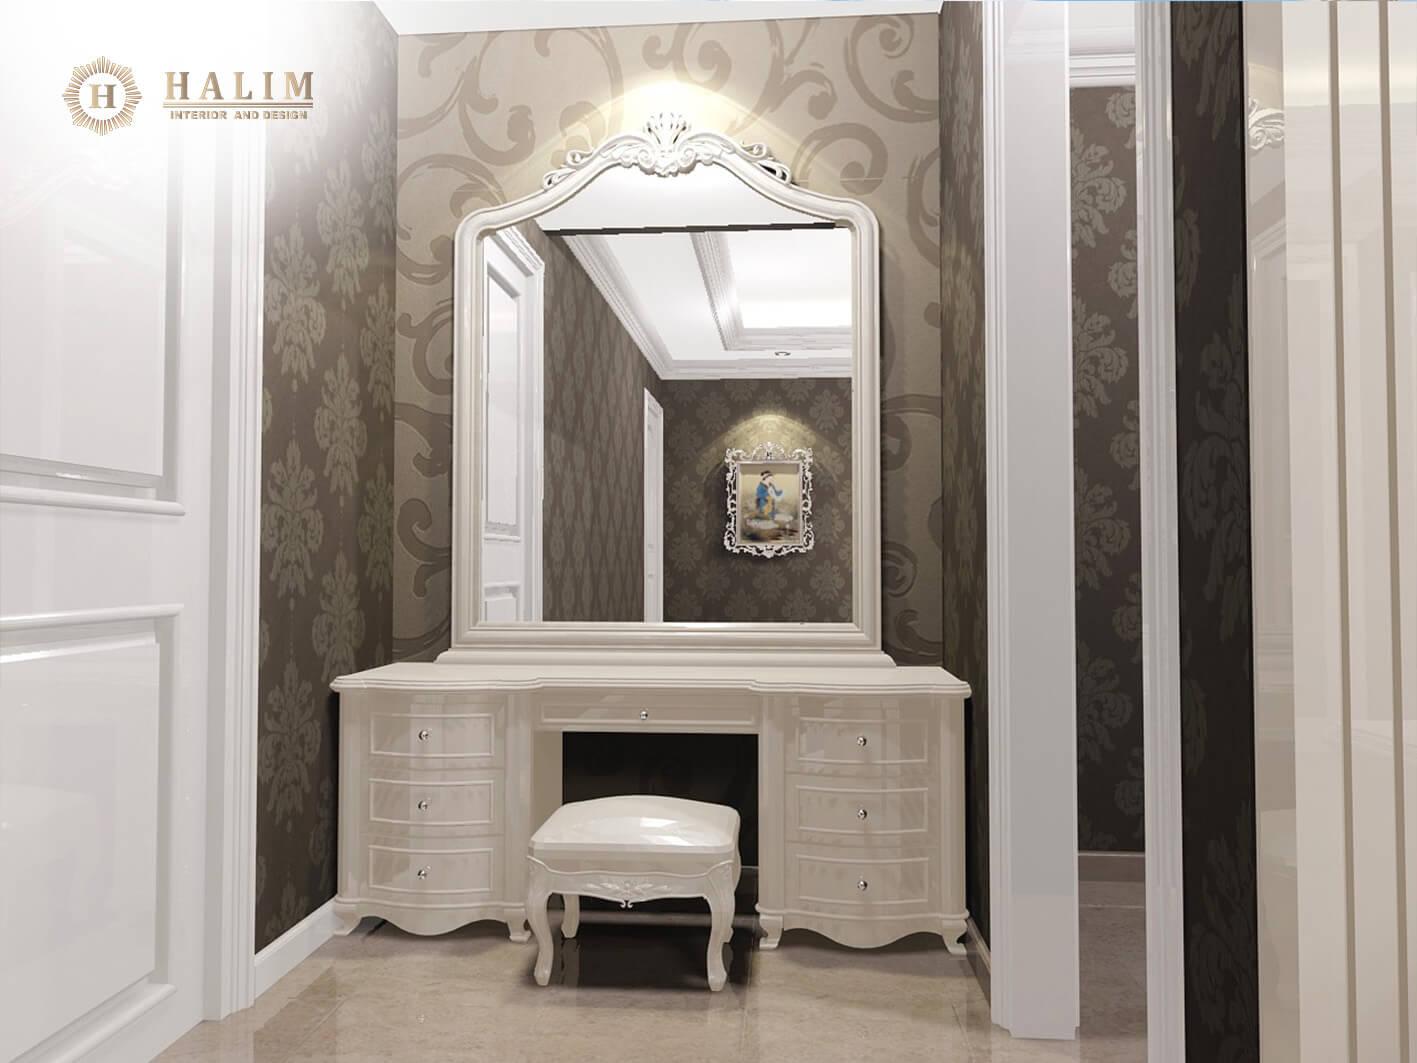 Halim, Interior, modern, furniture, contemporer american style, minimalist, european, classic, surabaya, 5 Pakuwon City